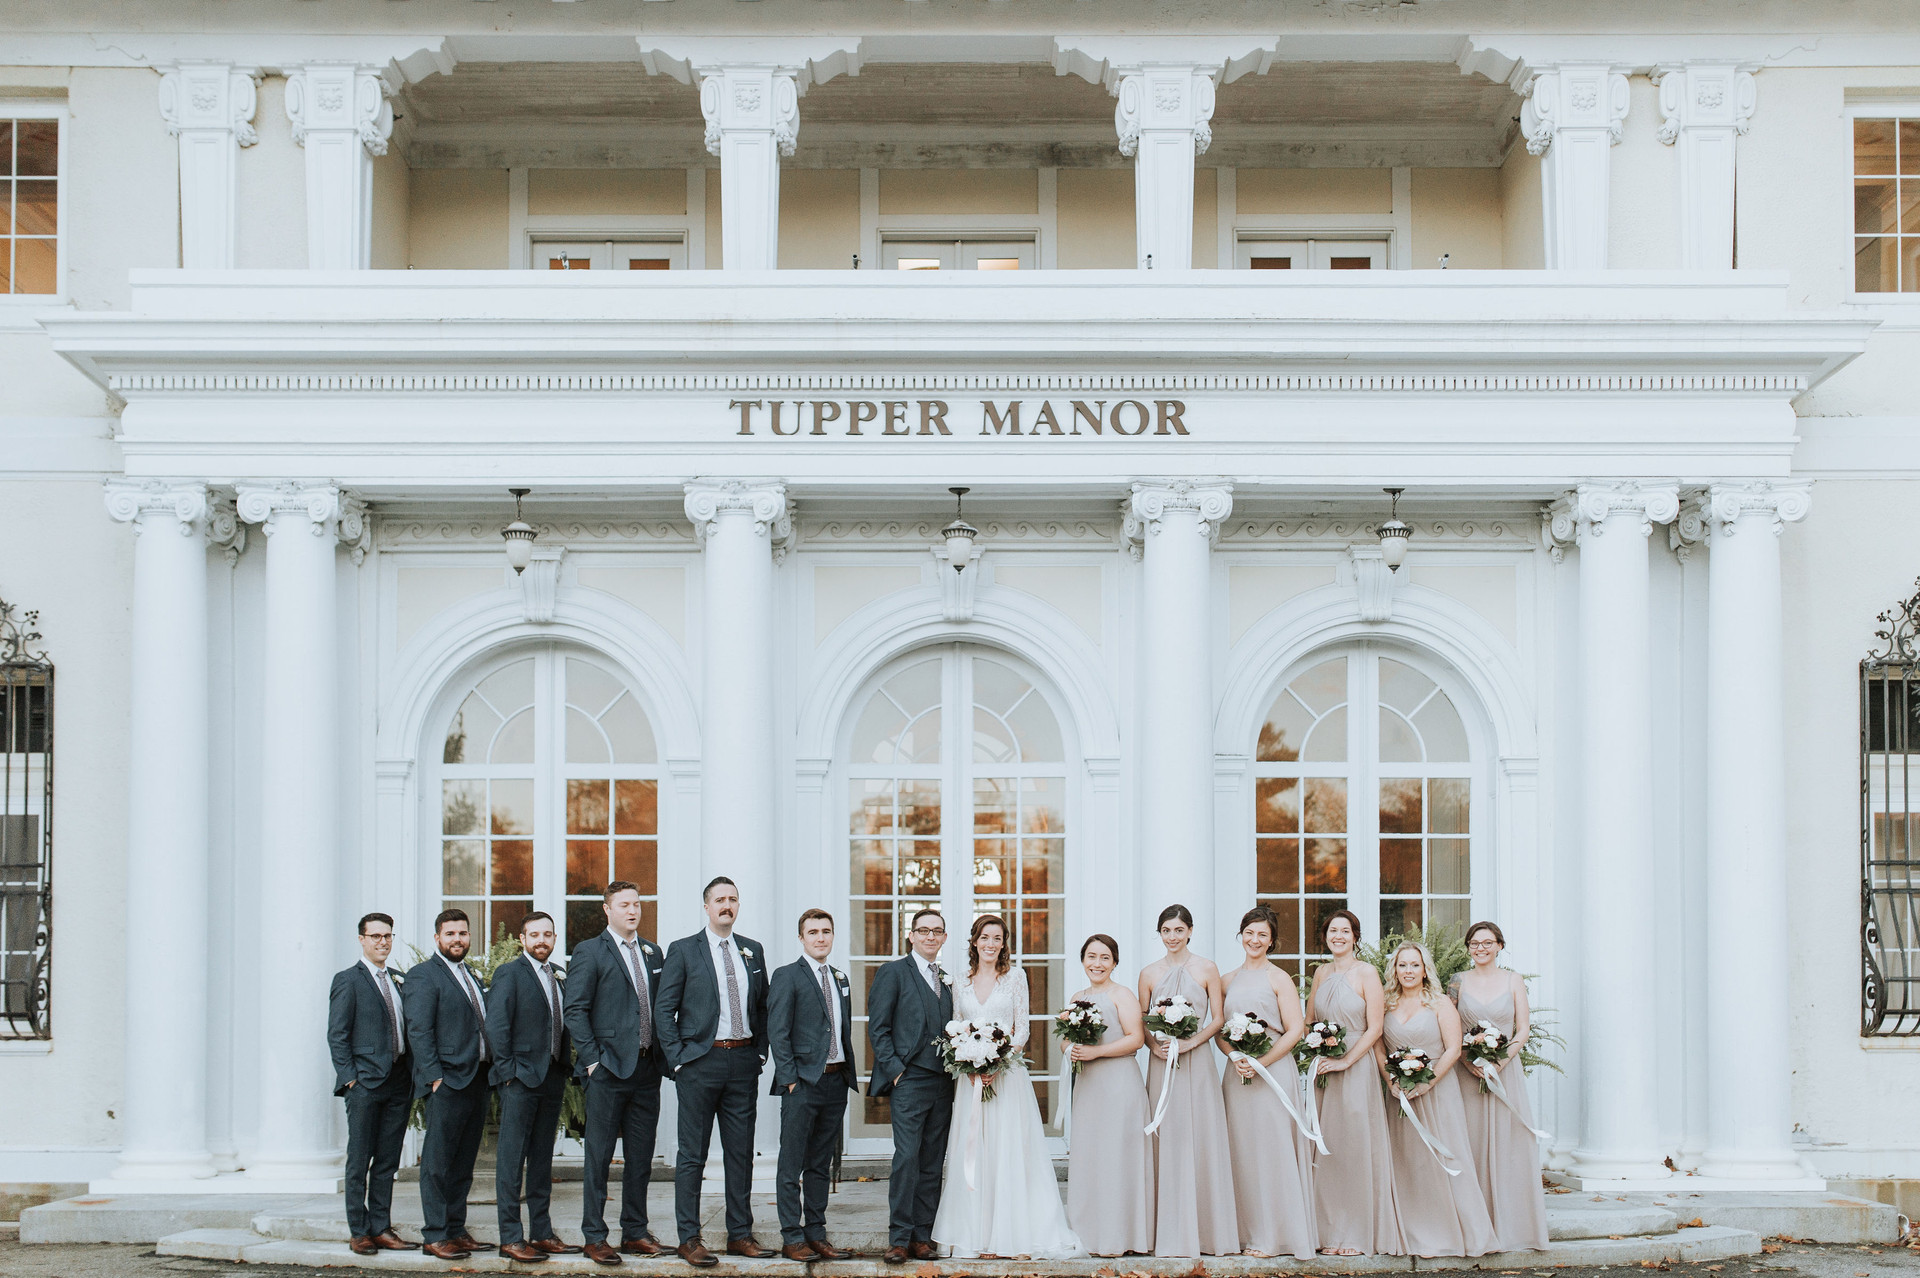 Tupper Manor Wedding Flowers,Elizabeth Willis Photography, Tuppor Manor, Beverly MA, Wedding Flowers, Fleur + Stitch, Fleur and Stitch, Fleur & Stitch